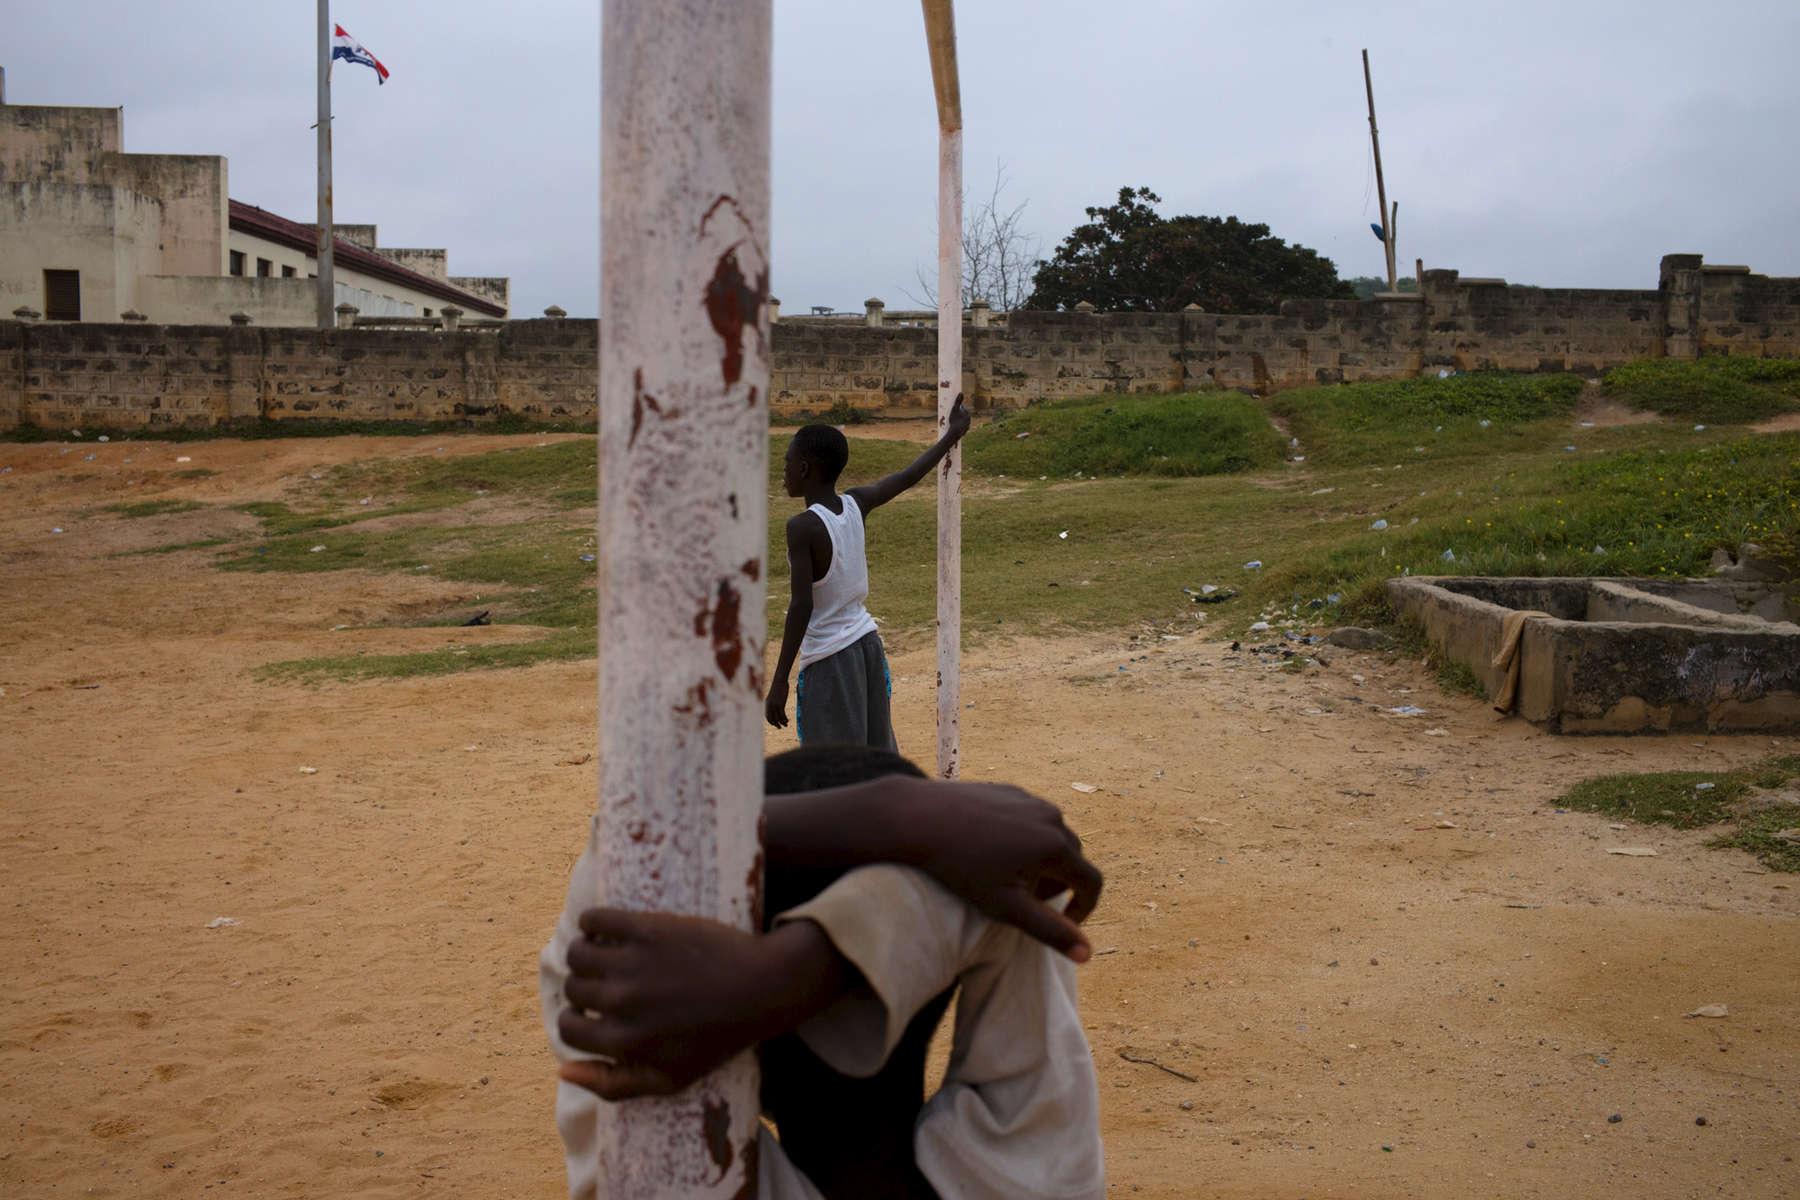 Ghana-day-3-20